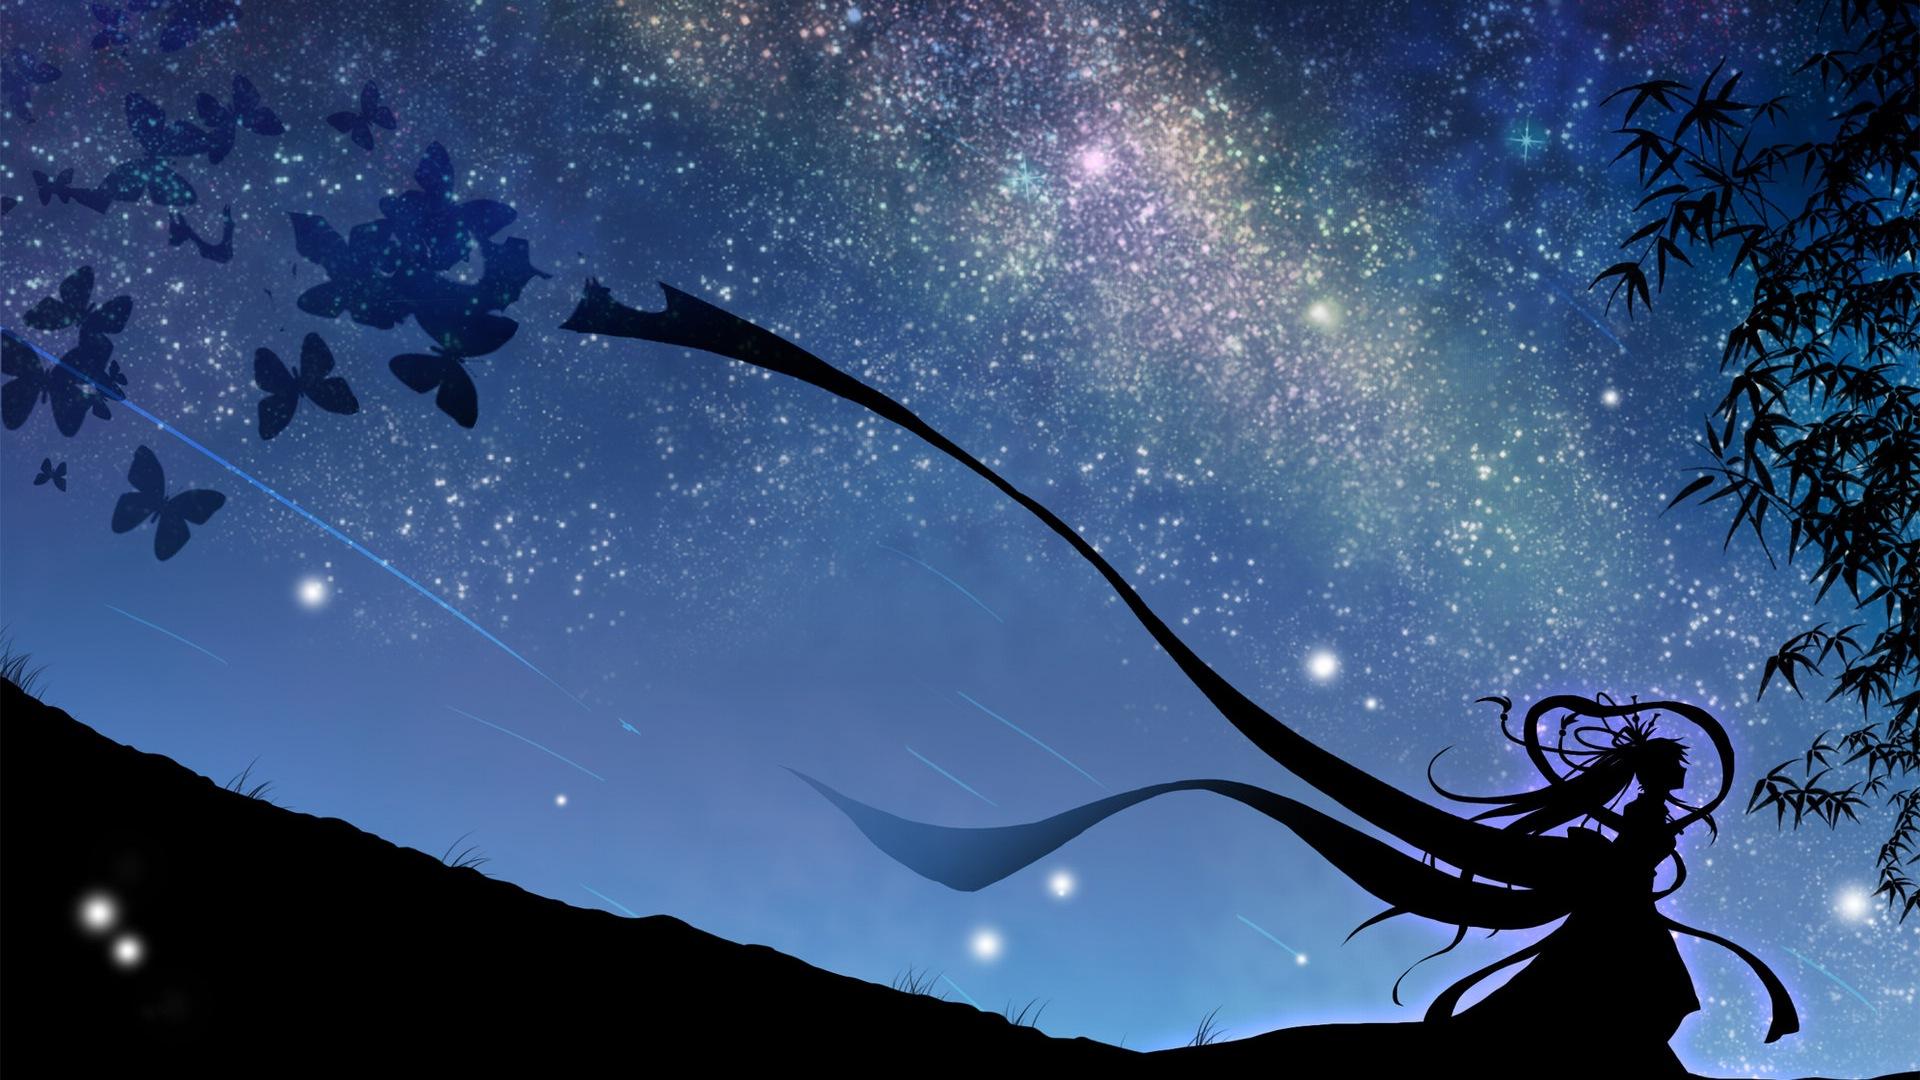 Luciole t beau fond d 39 cran anime 8 1920x1080 fond d for Fond ecran animation